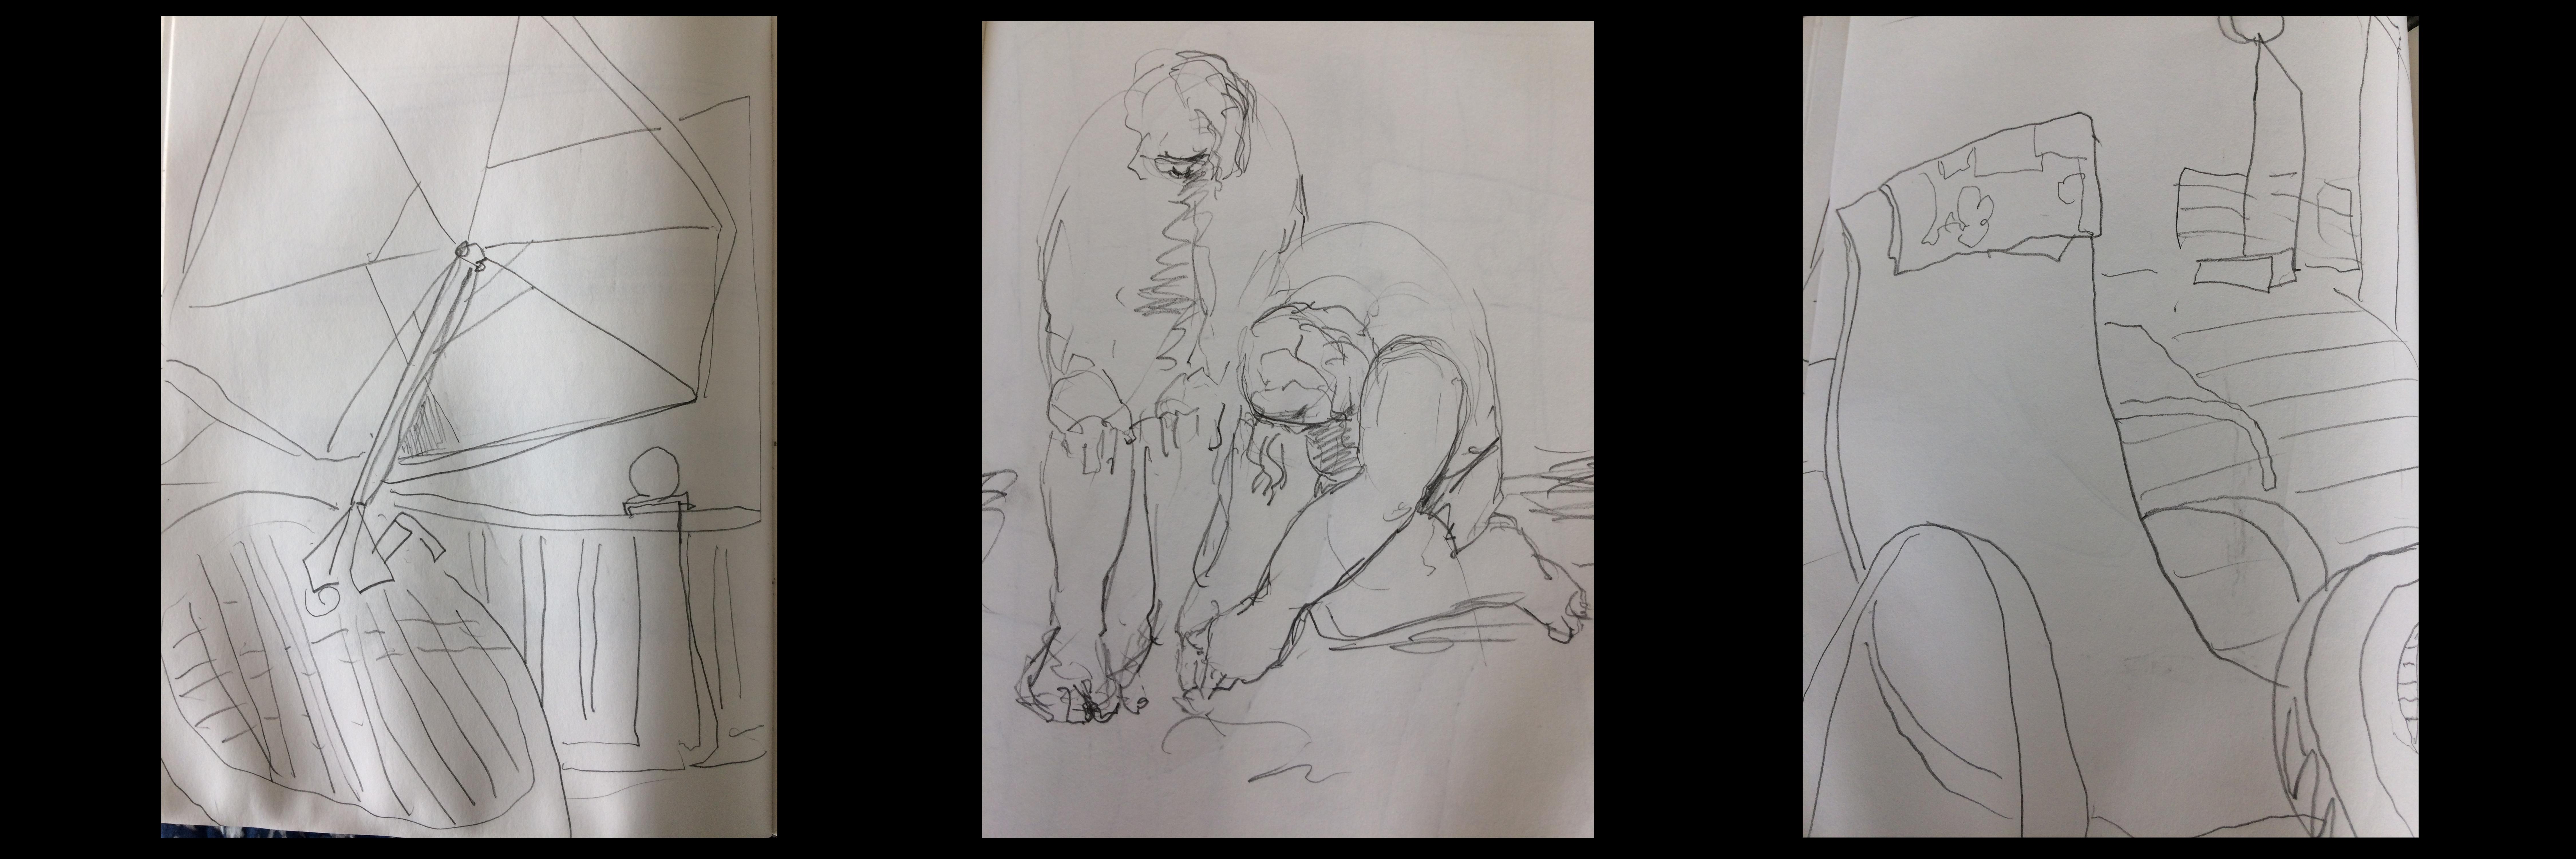 HH sketches copy